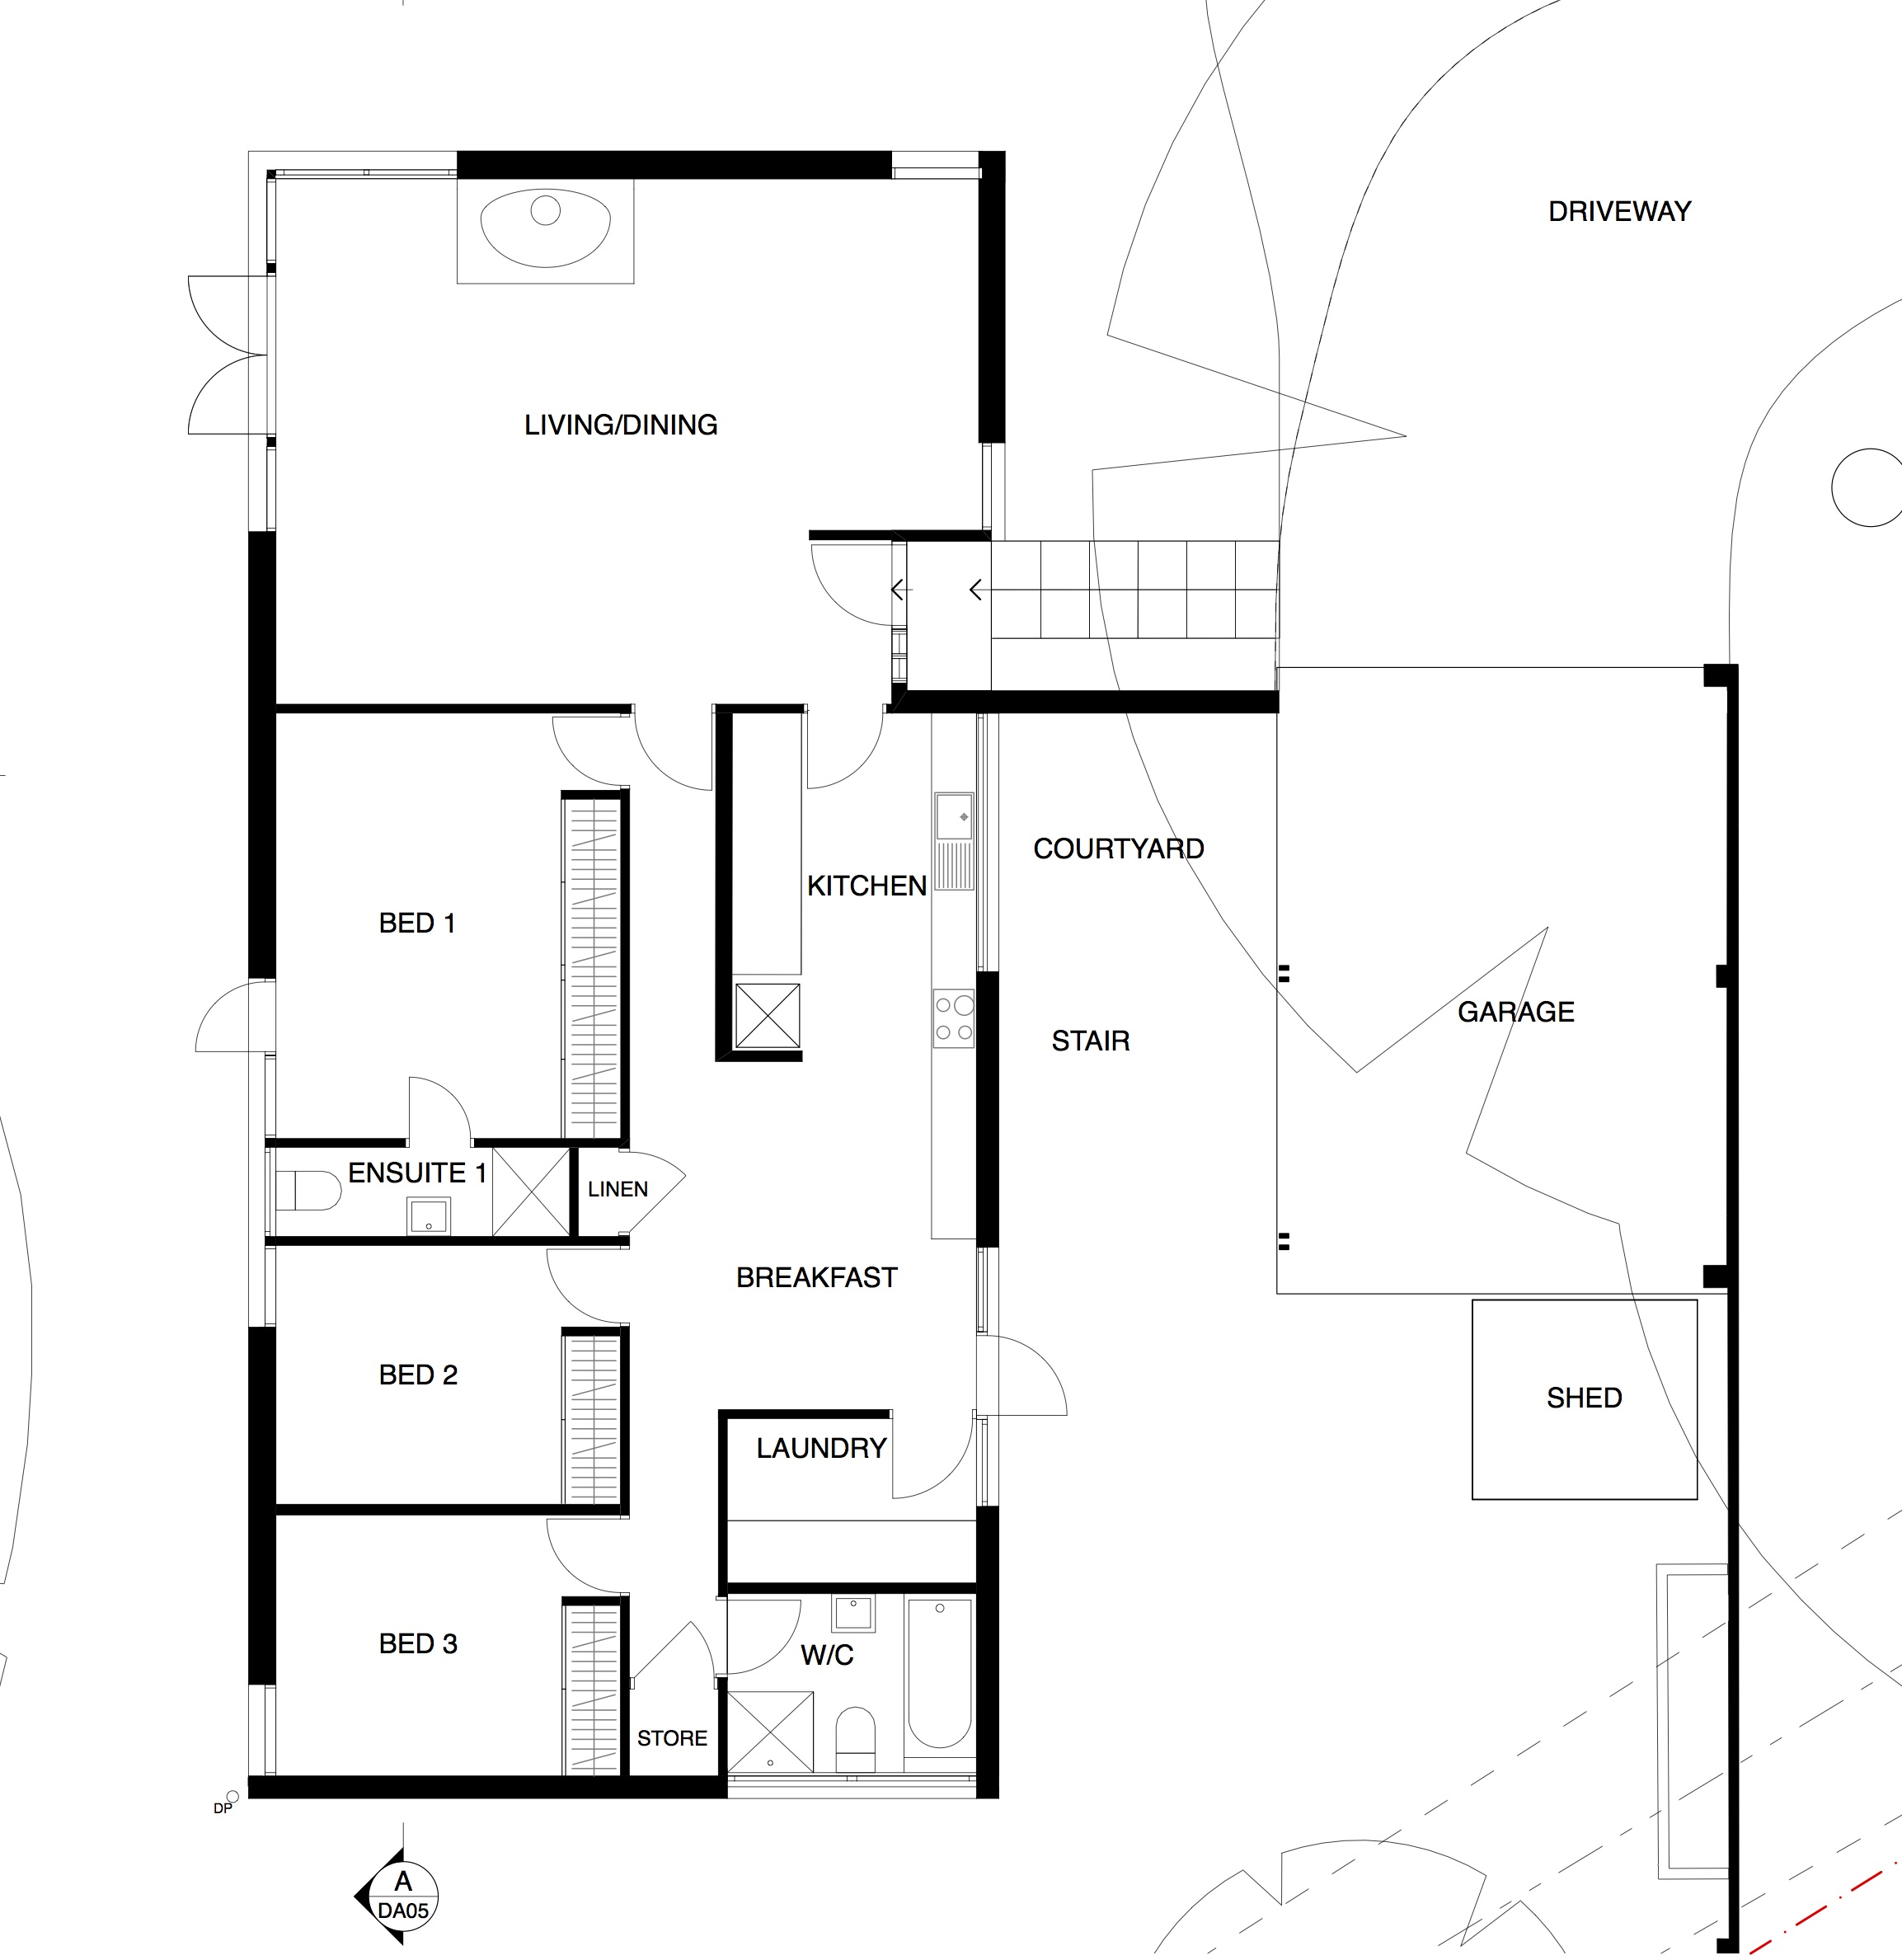 single storeyness the floorplan conundrum sydney house lowlineexample